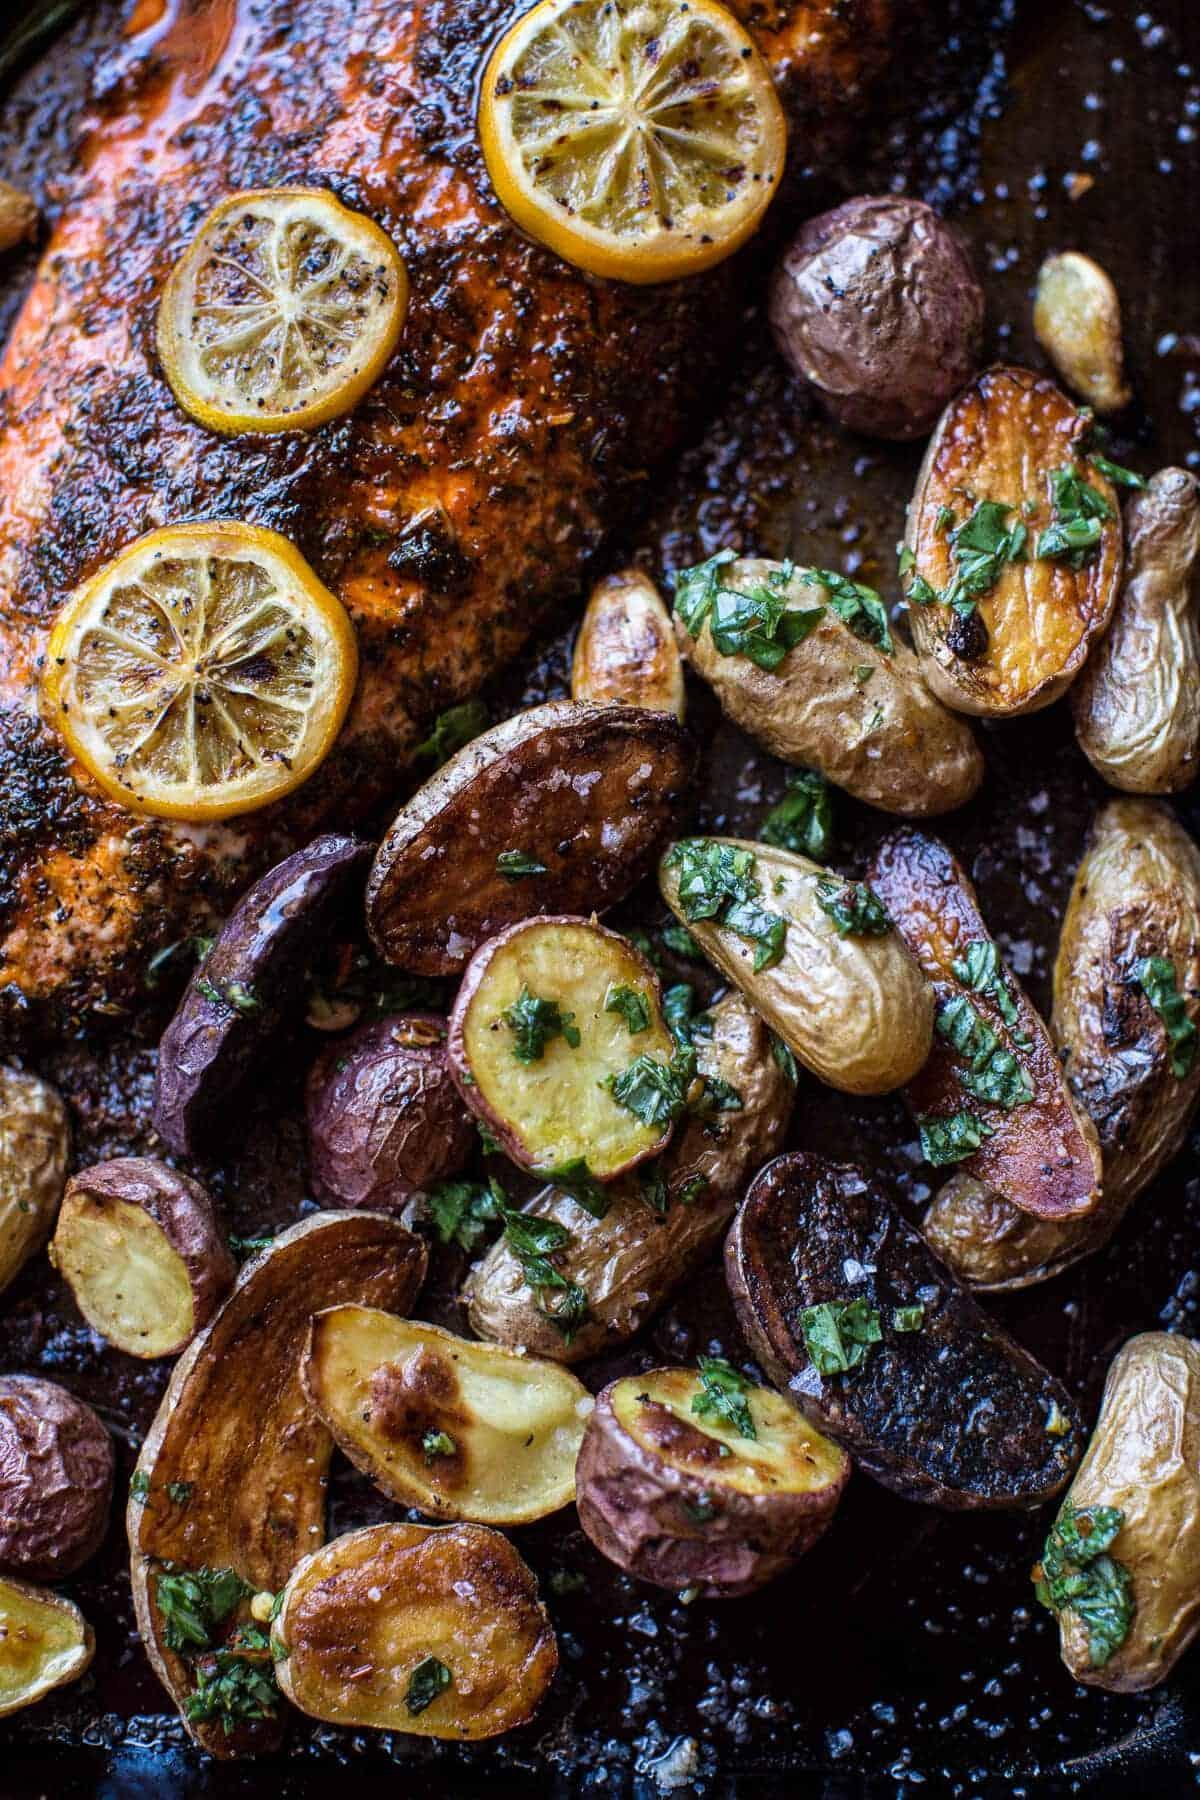 One Pan Lemon Roasted Salmon, Potatoes and Parmesan Asparagus | halfbakedharvest.com @hbharvest